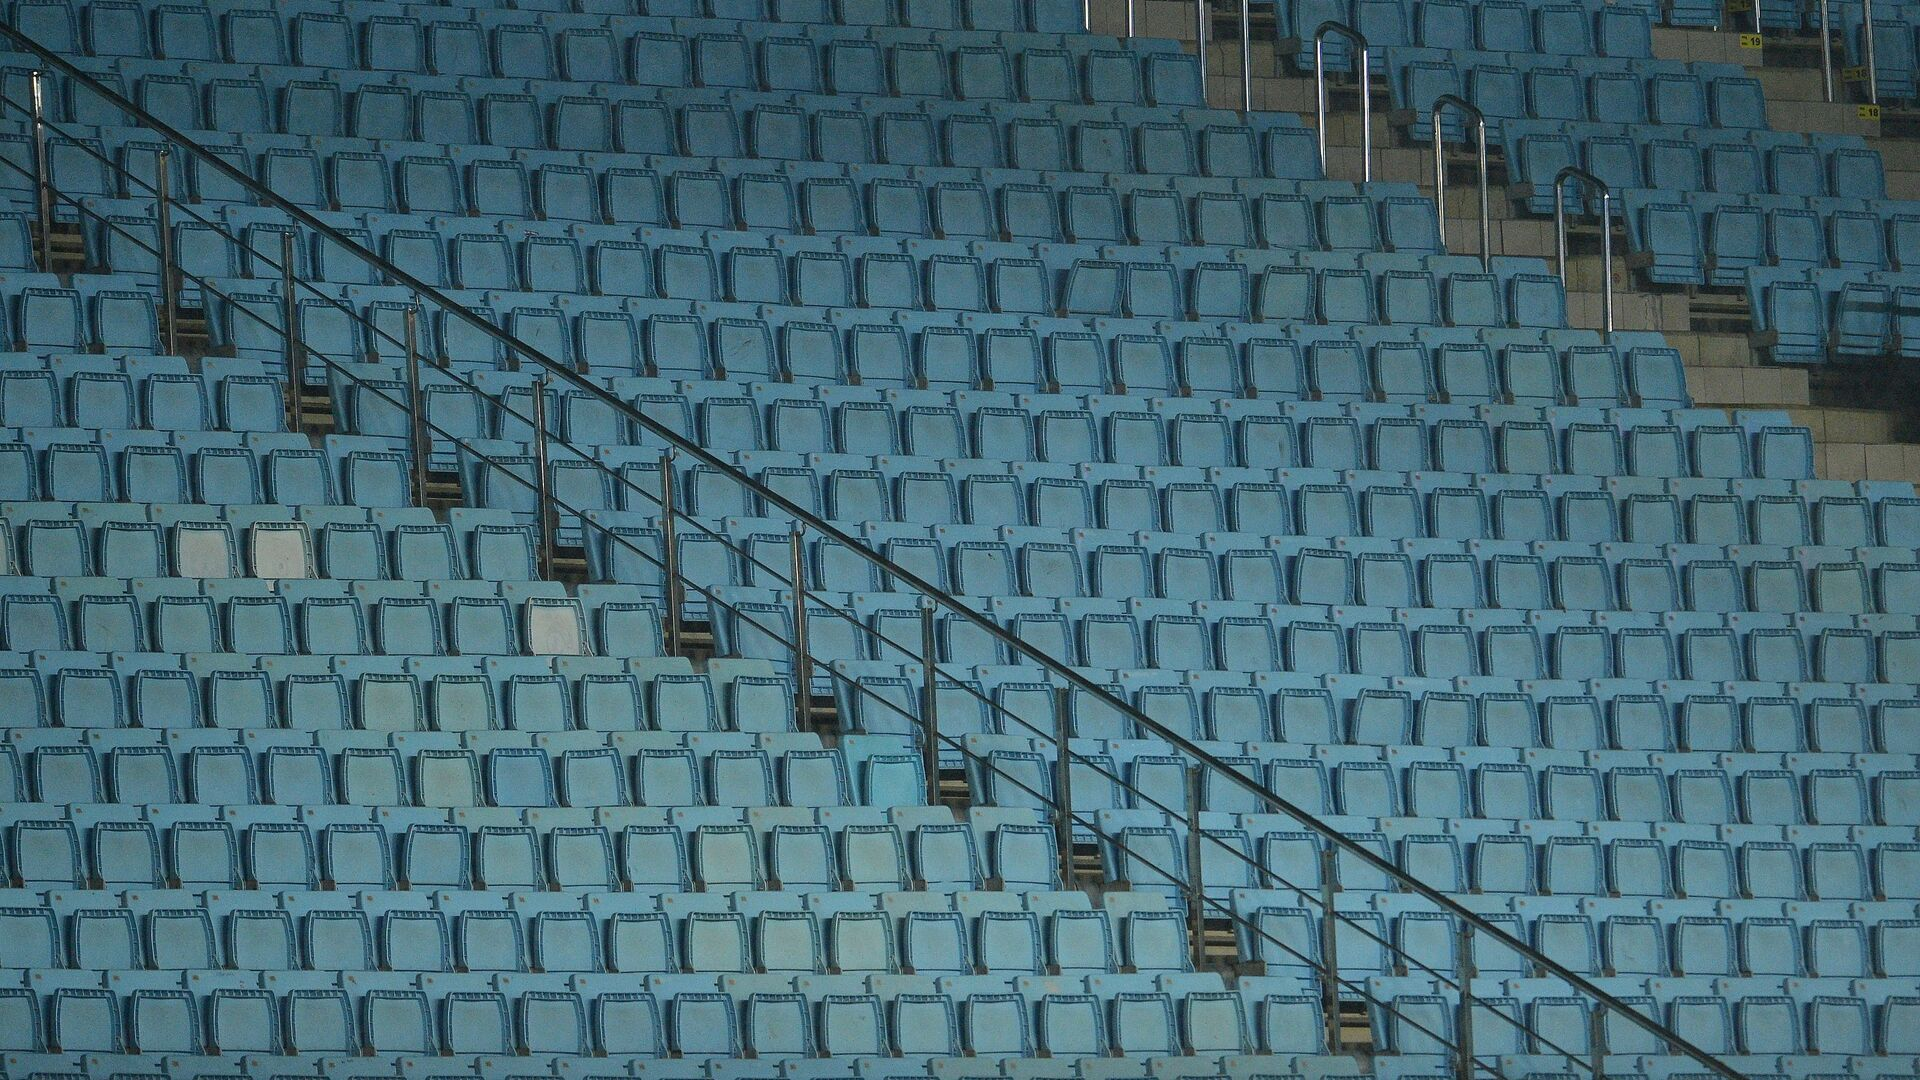 Футбол. Лига чемпионов. Матч ЦСКА - Манчестер Сити - РИА Новости, 1920, 03.09.2020